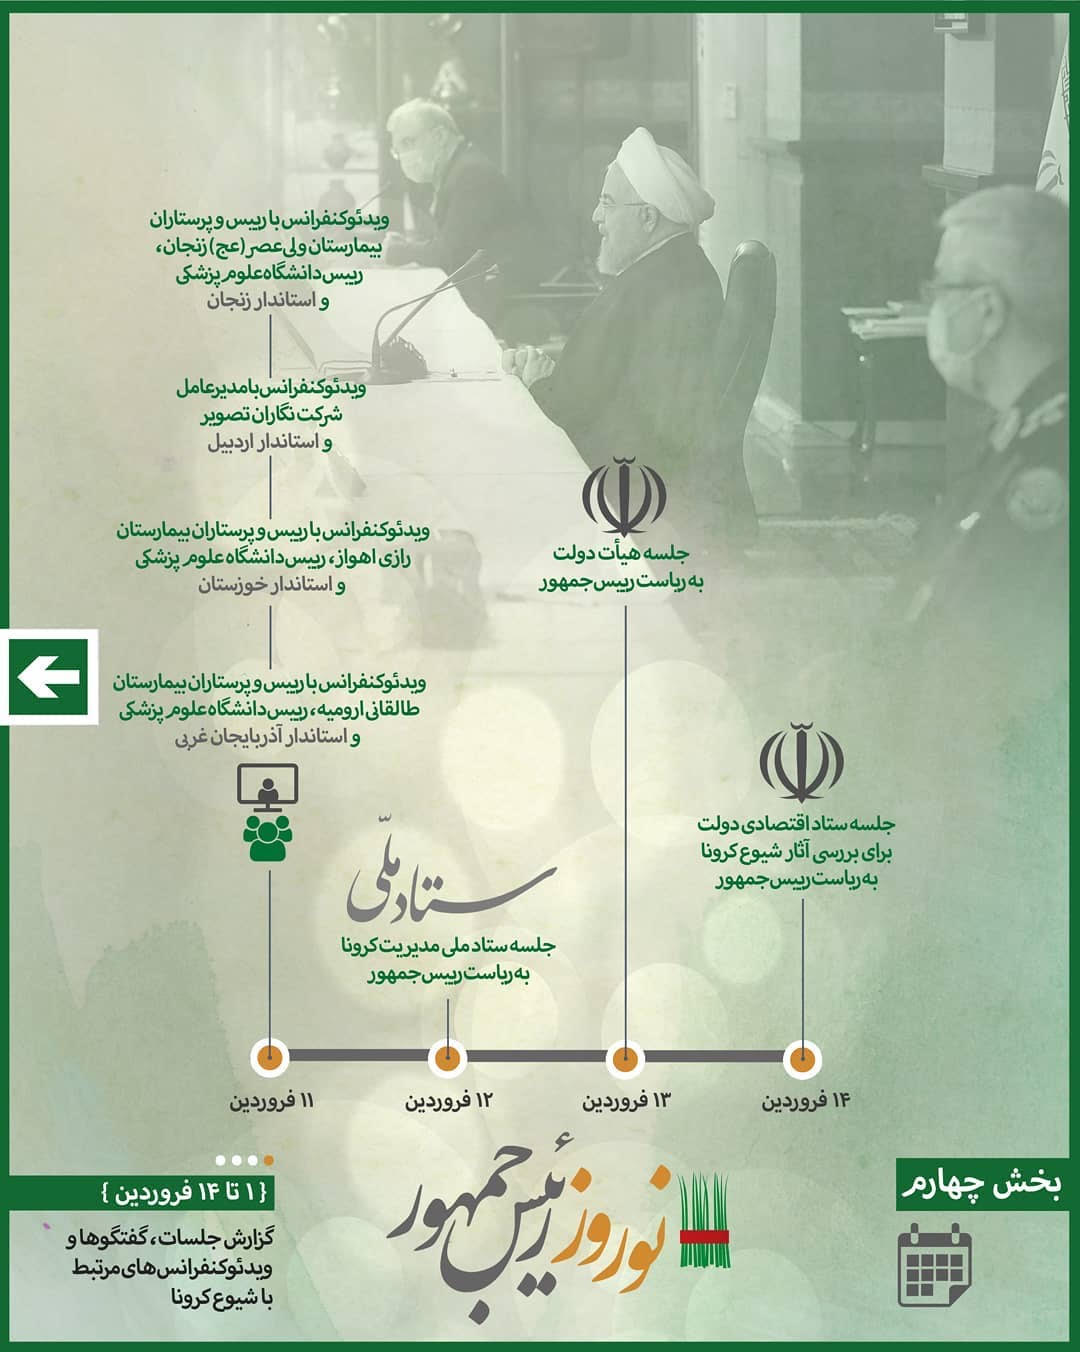 نوروز متفاوت رییسجمهور روحانی